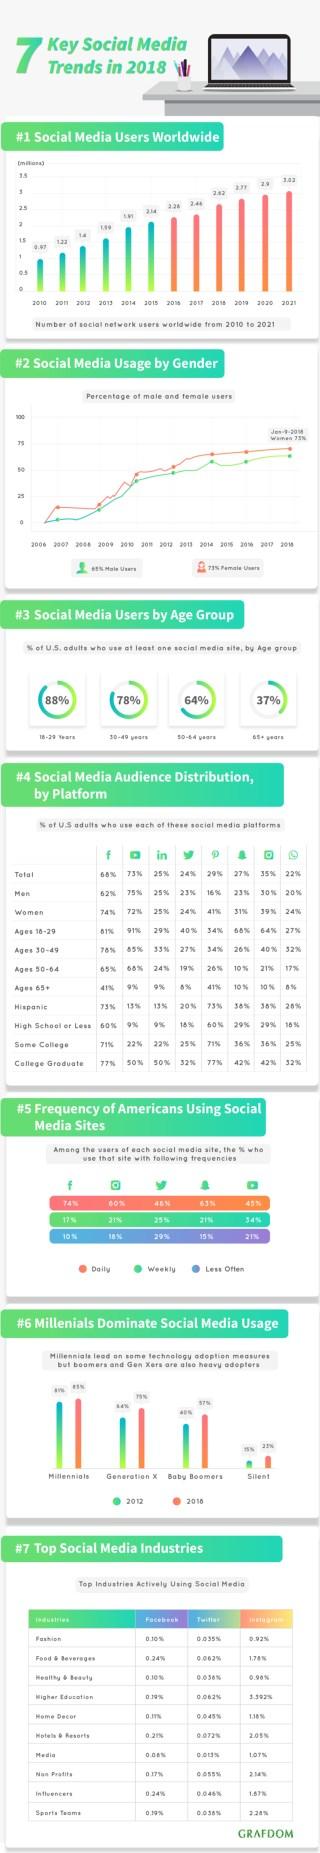 7 Key Social Media Trends for 2019